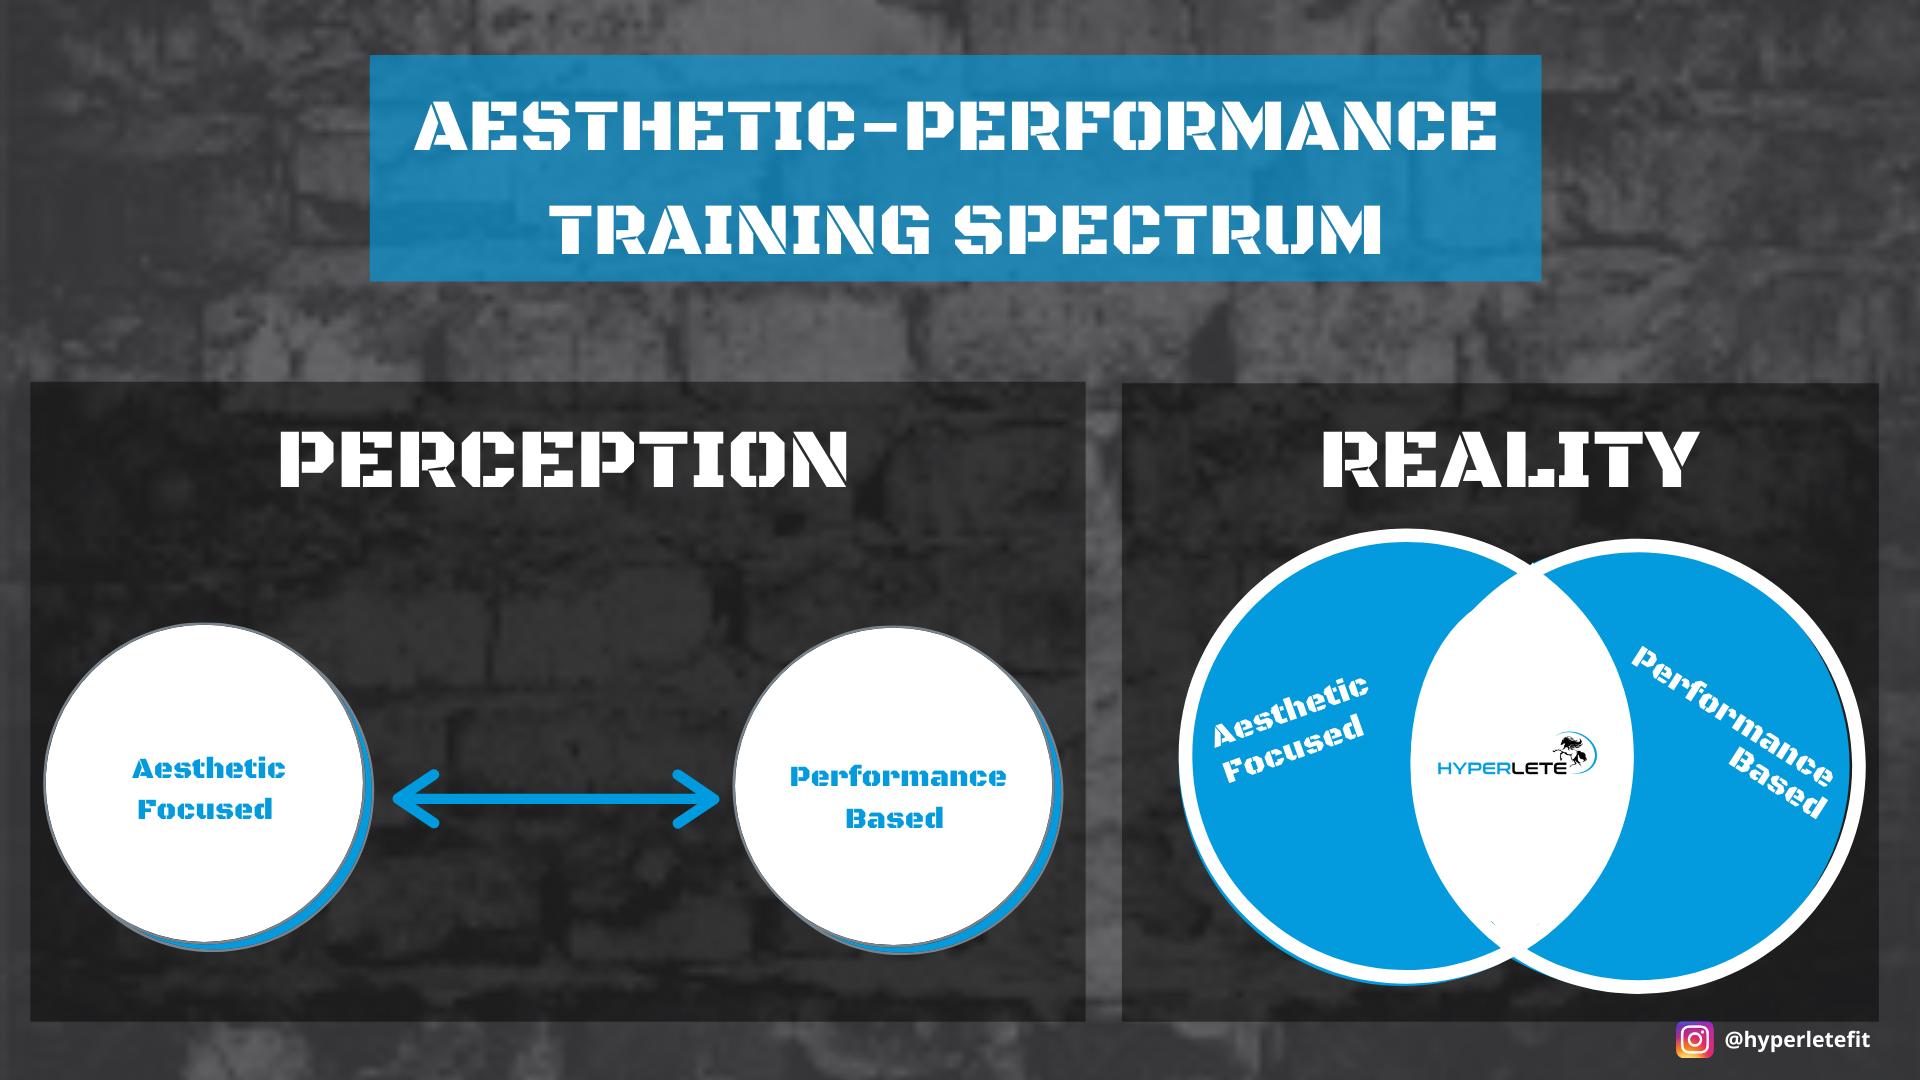 Aesthetic-Performance Training Spectrum